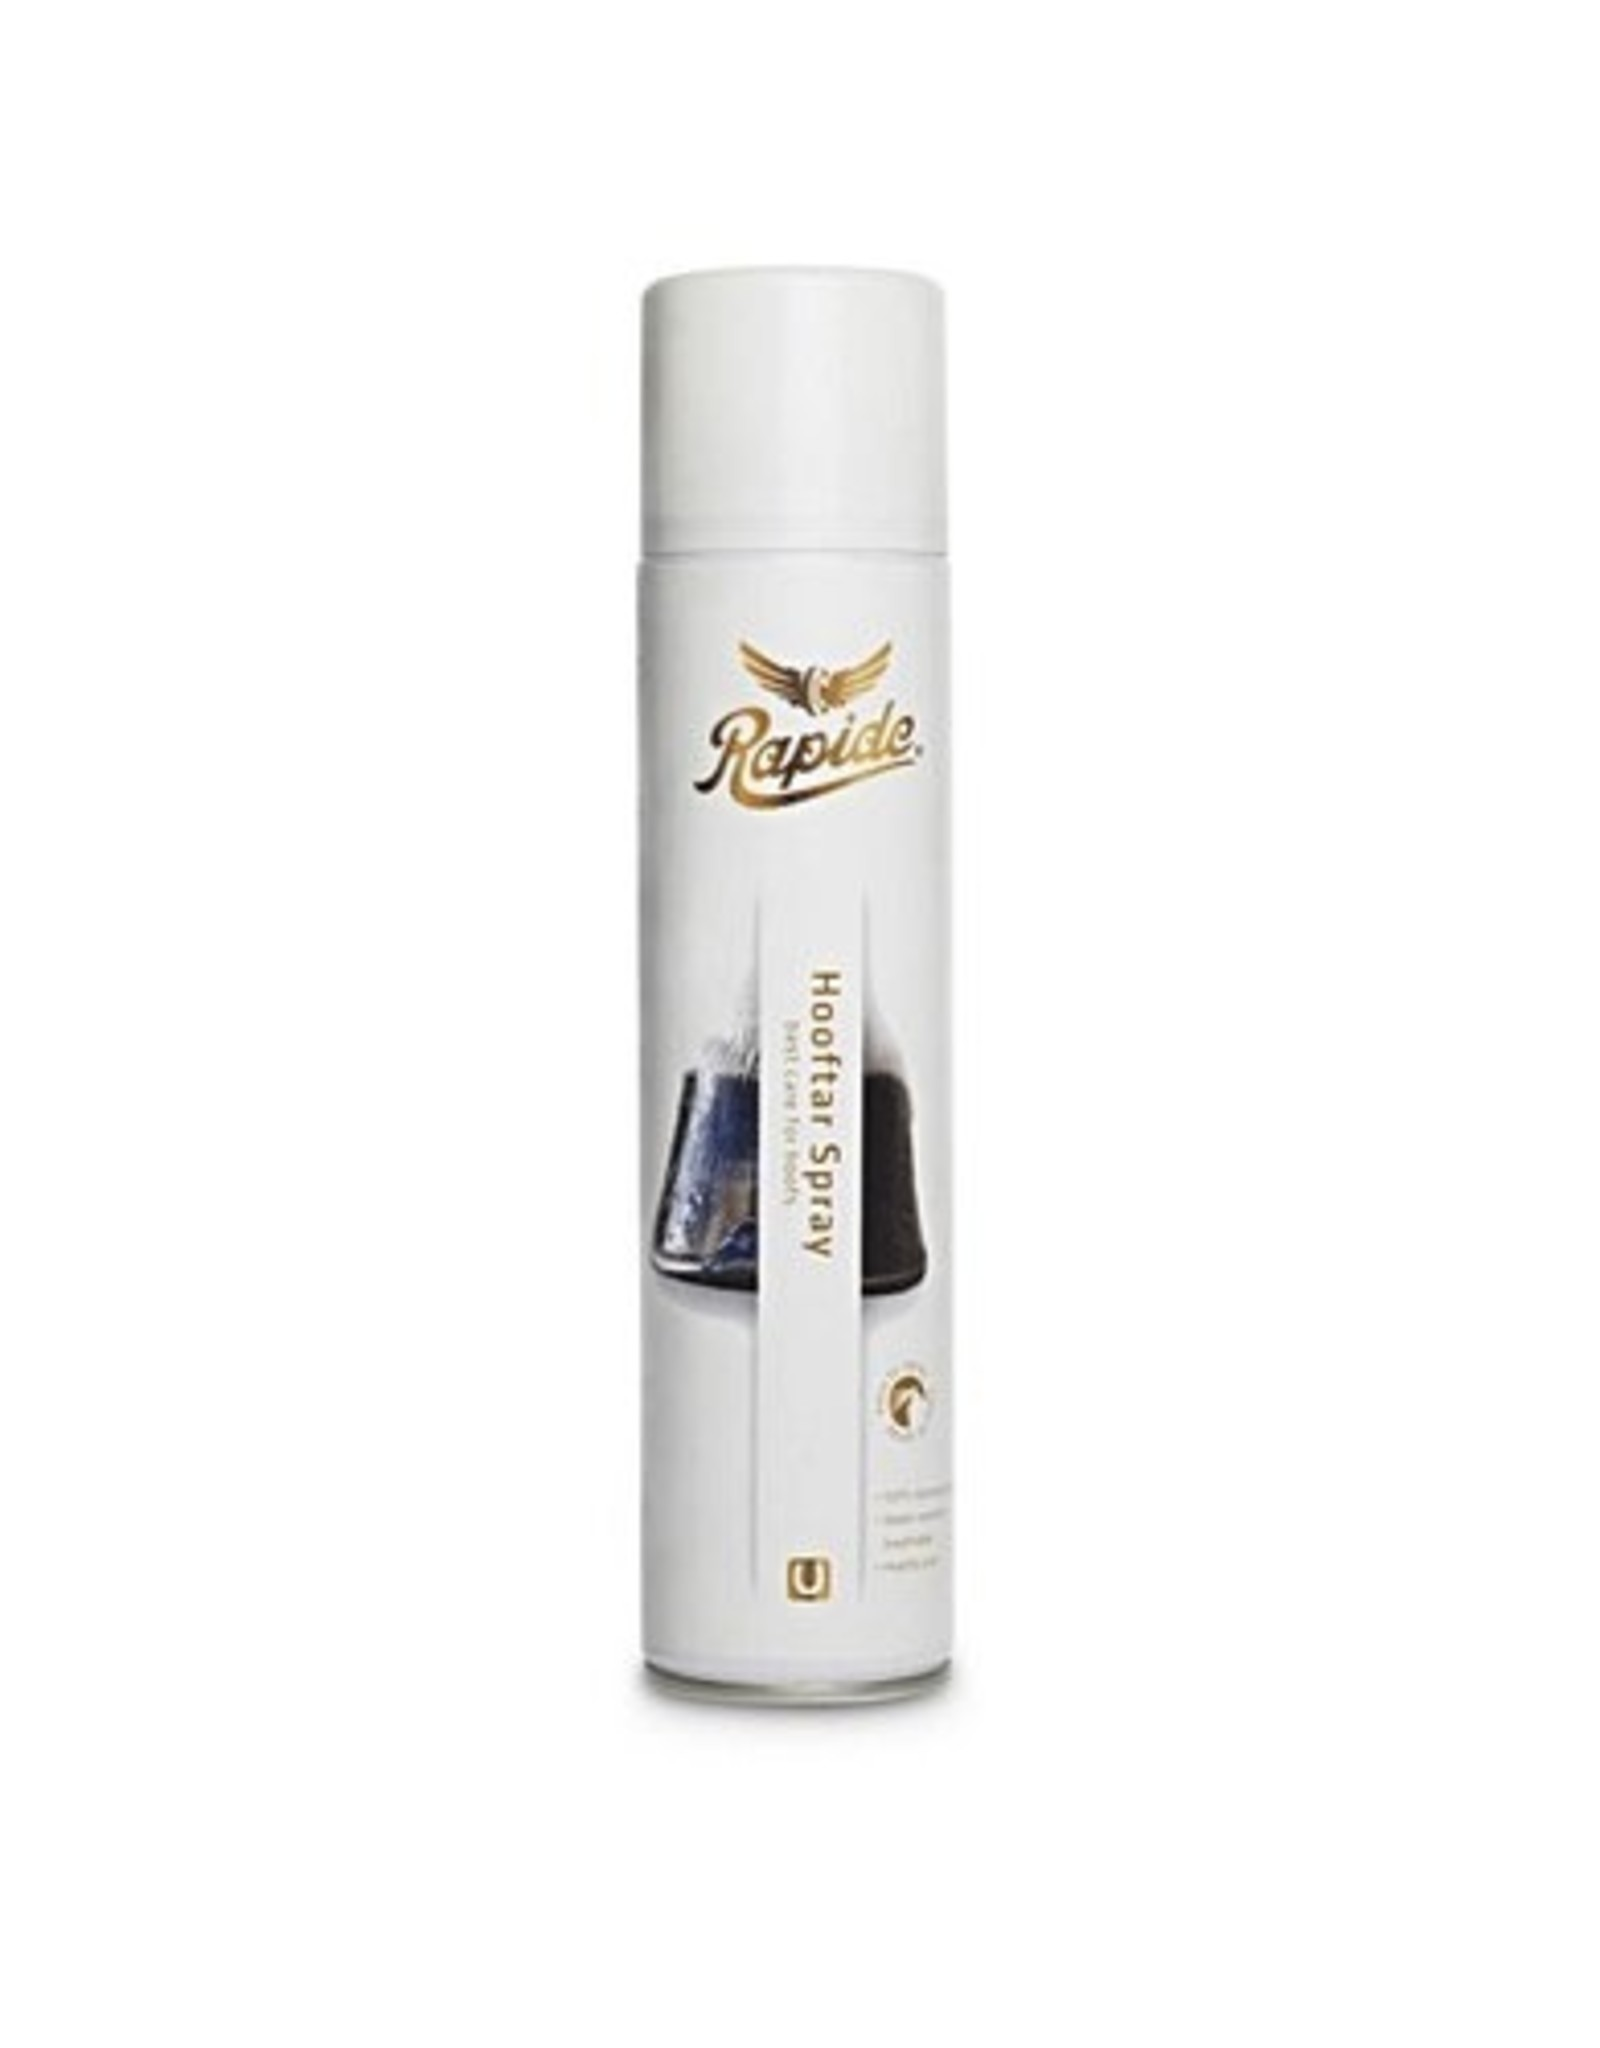 Rapide Rapide Hoefteer spray 300ml